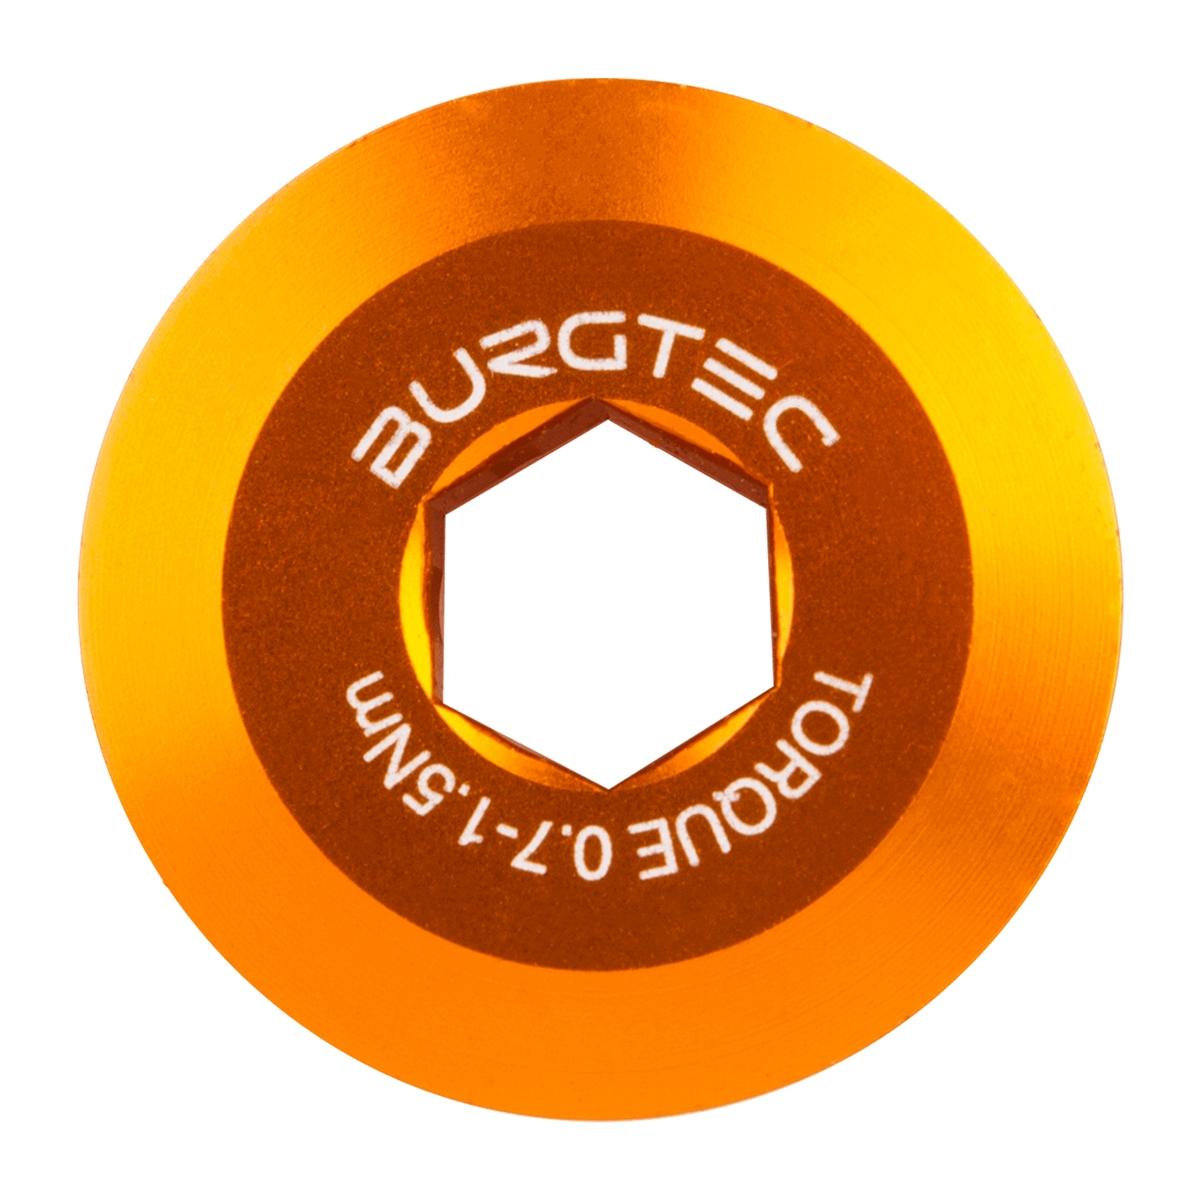 Pre-tension Bolt for Shimano Hollowtech II Cranks orange 9526